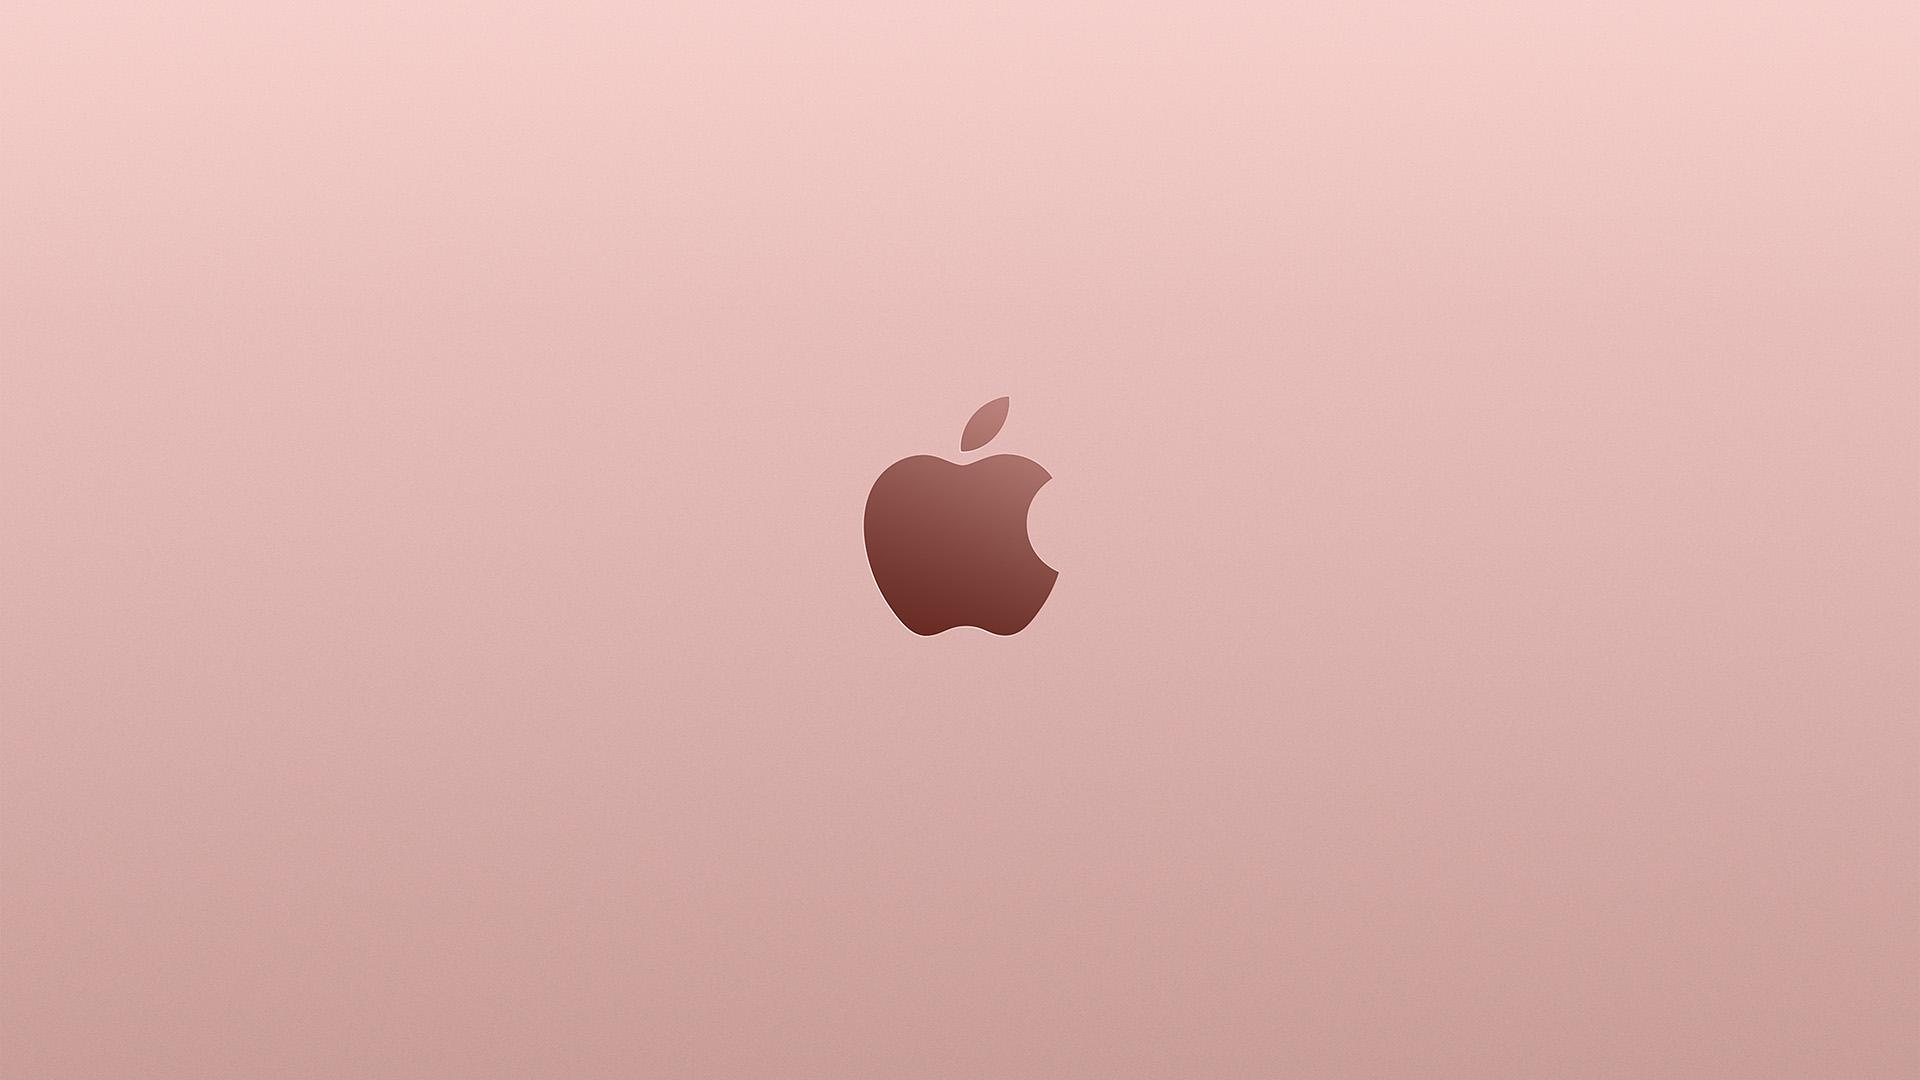 See pink flowers background stock video clips. au11-apple-pink-rose-gold-minimal-illustration-art-wallpaper